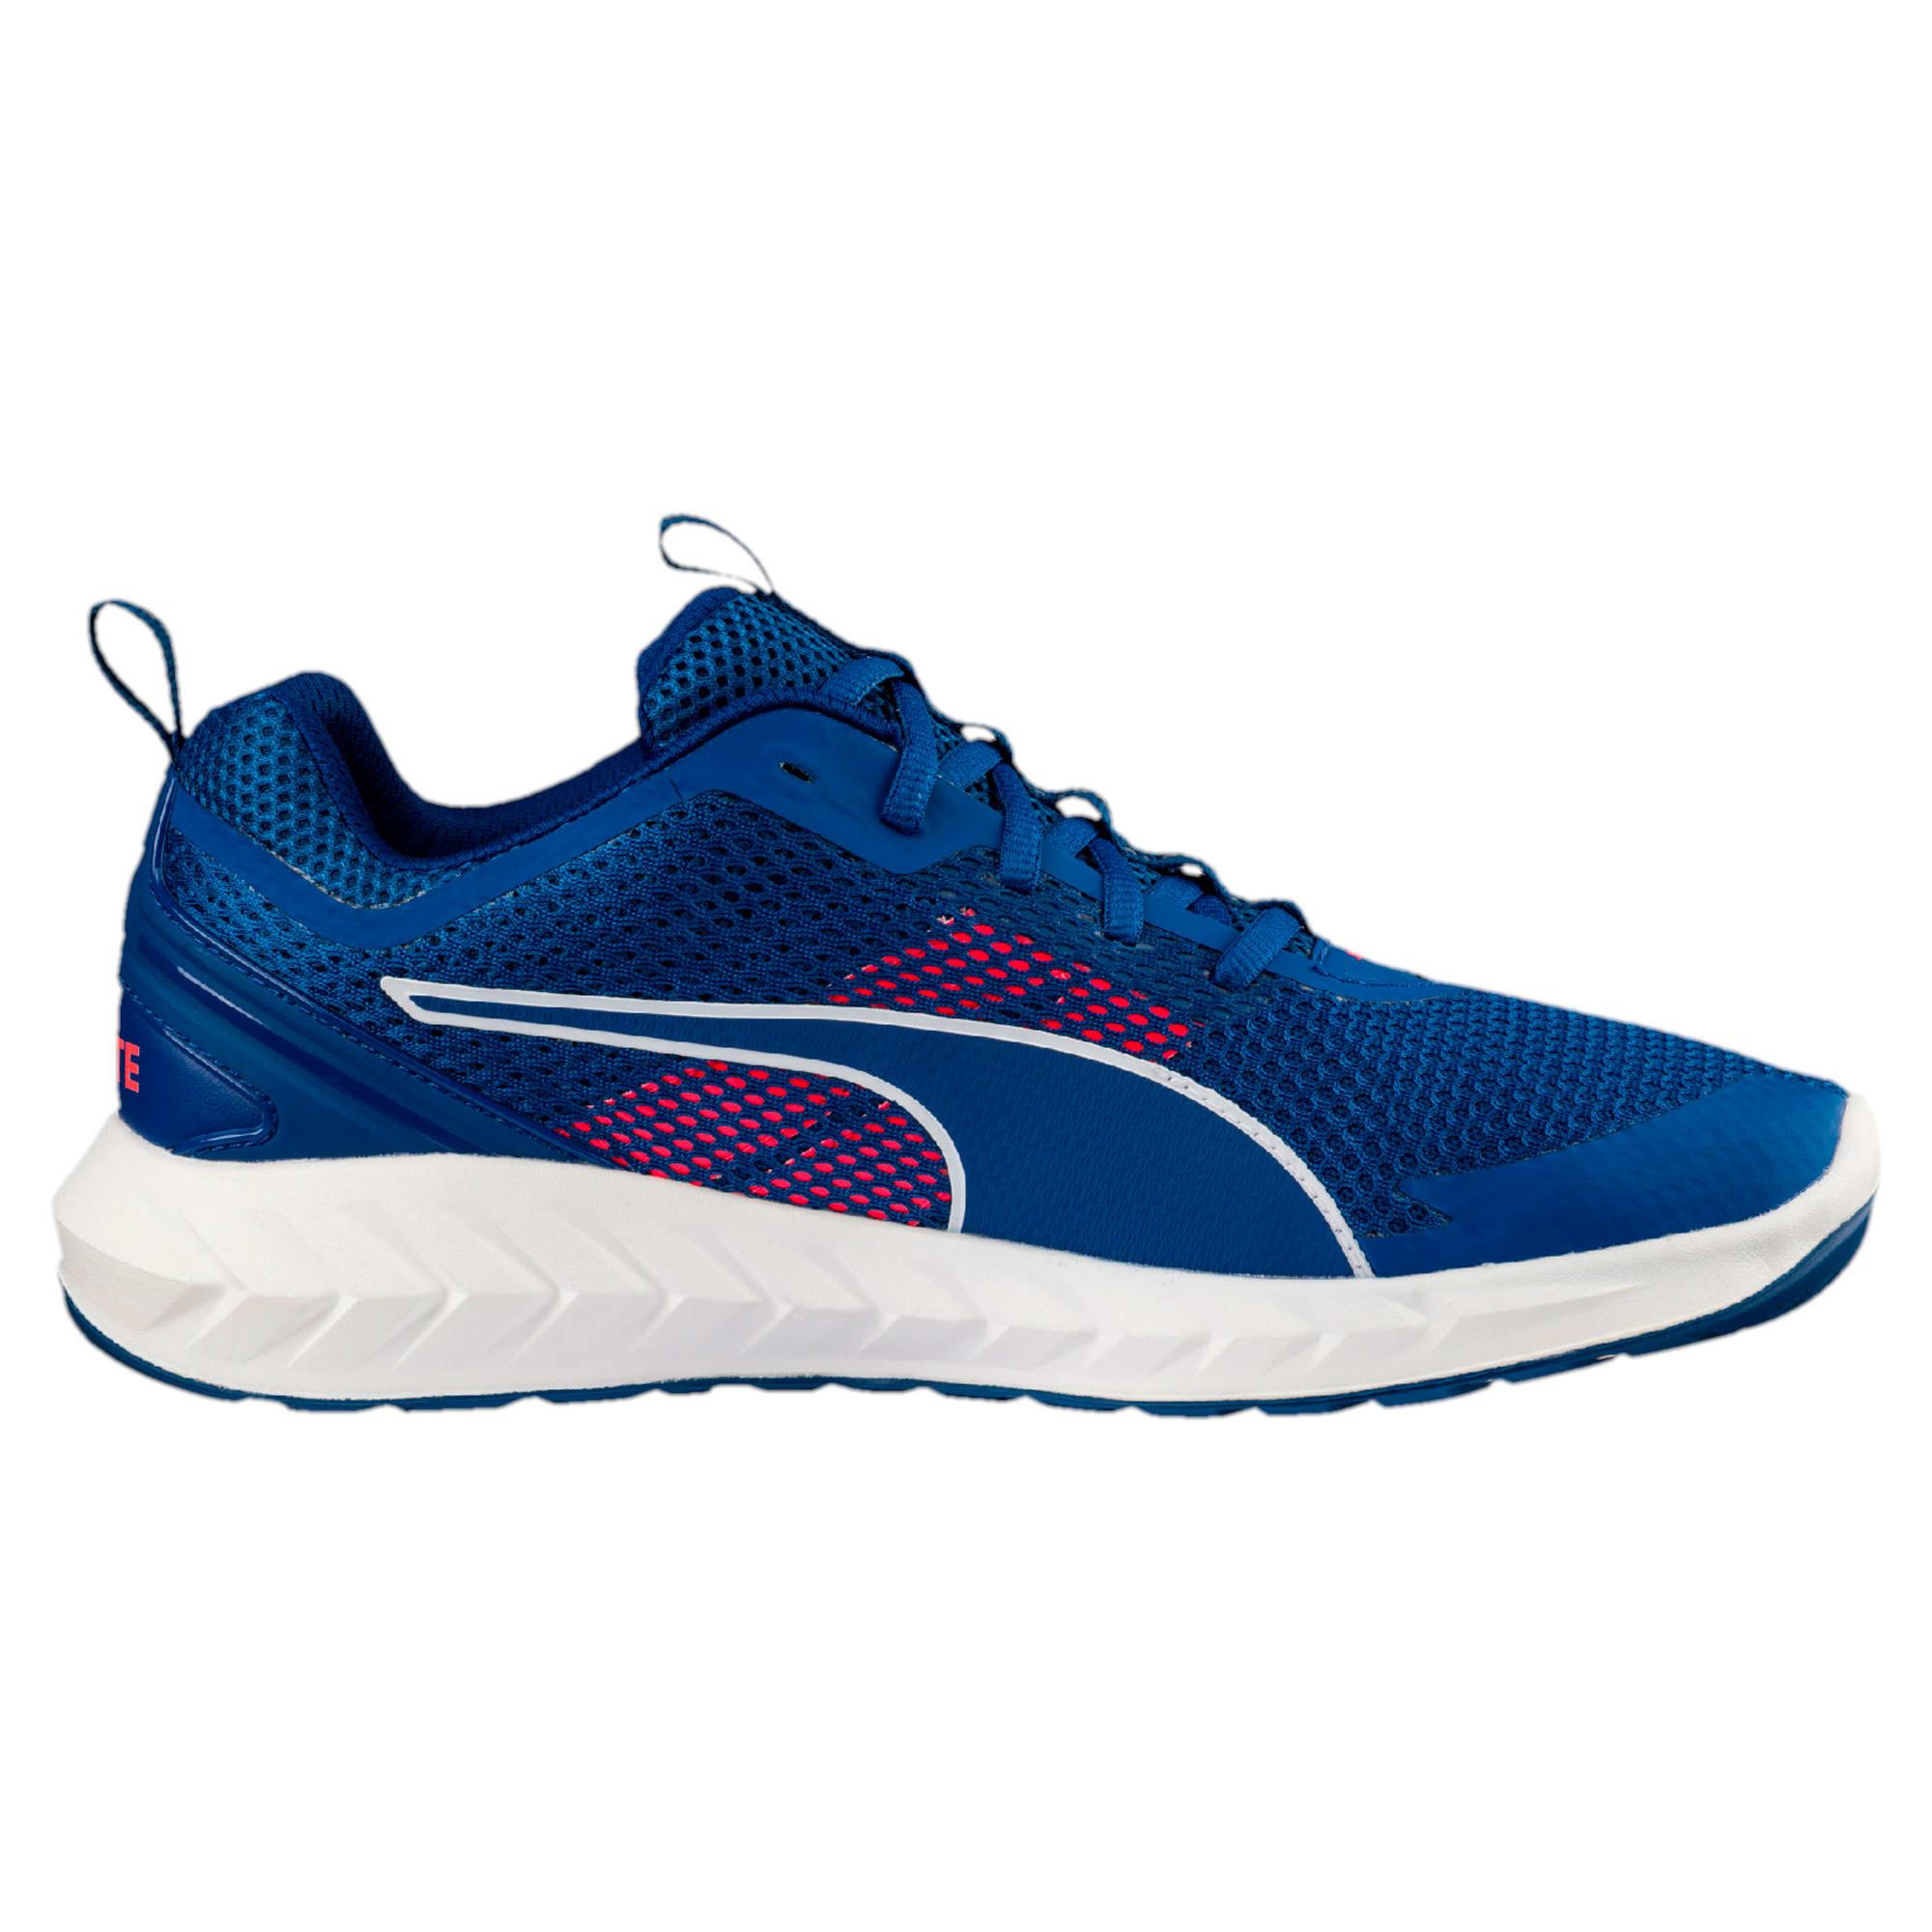 Thumbnail 5 of IGNITE Ultimate 2 Men's Running Shoes, TRUE BLUE-Bright Plasma, medium-IND